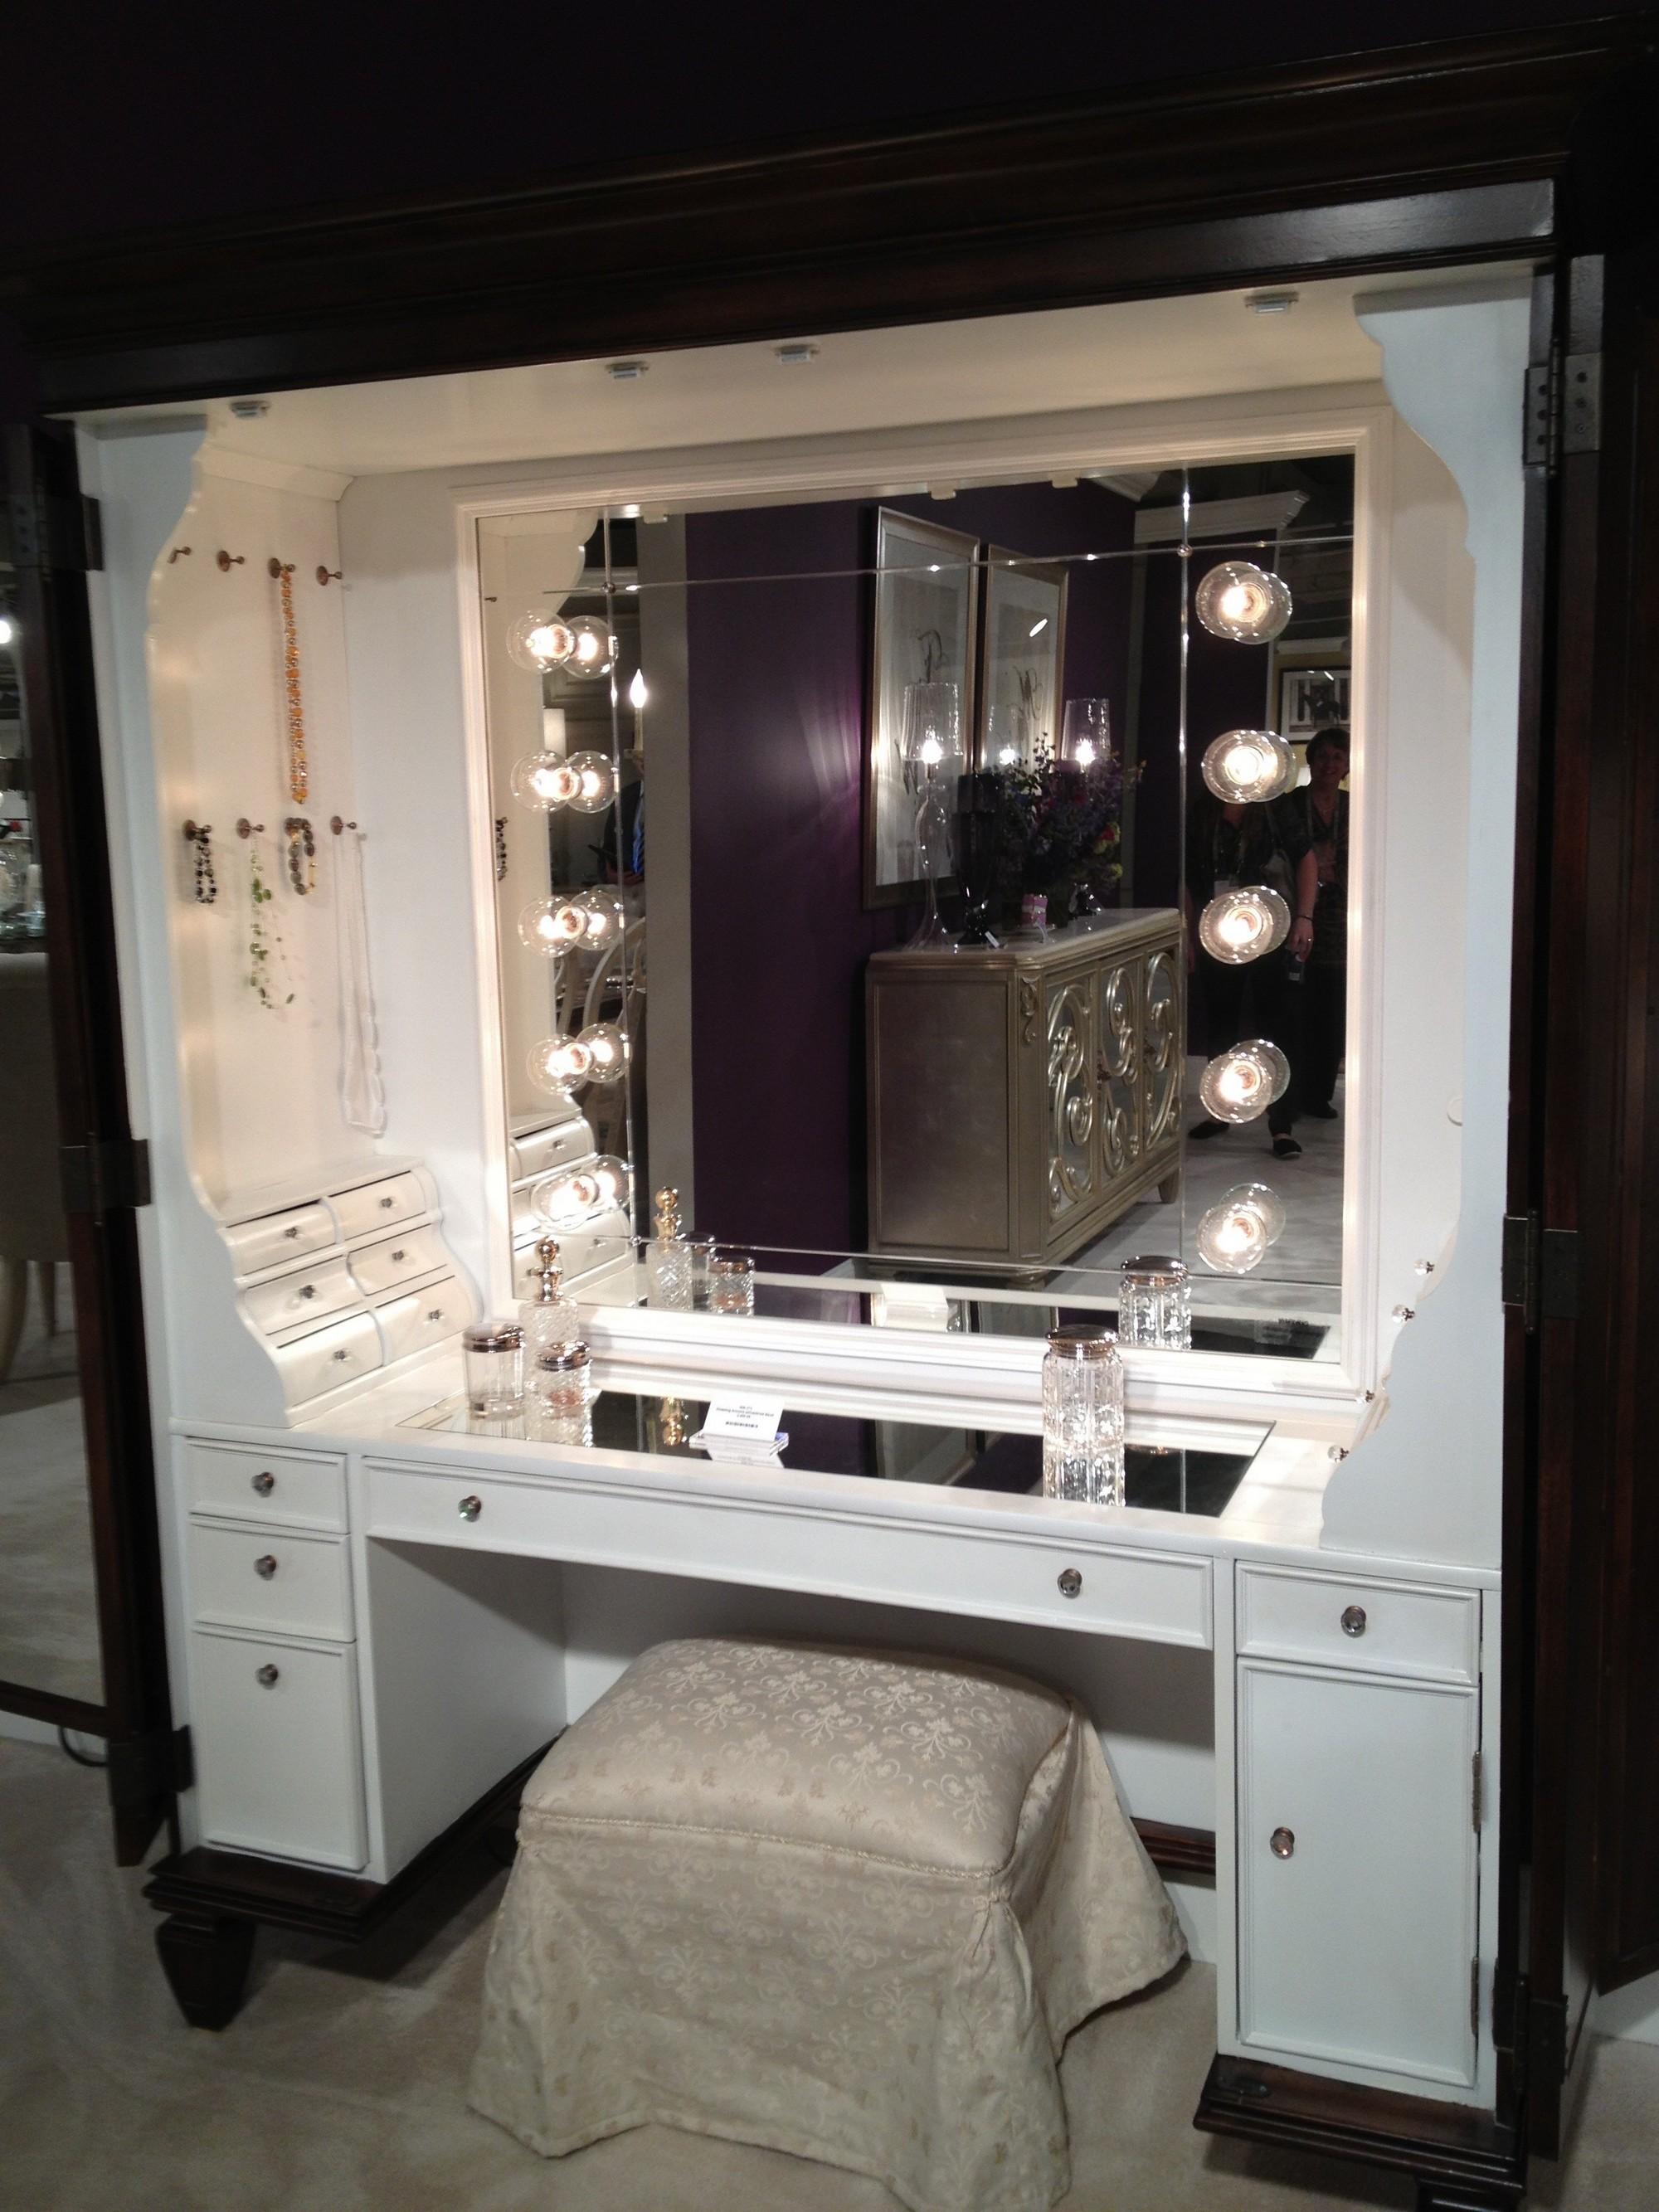 Makeup Vanity Table with Lights - HomesFeed